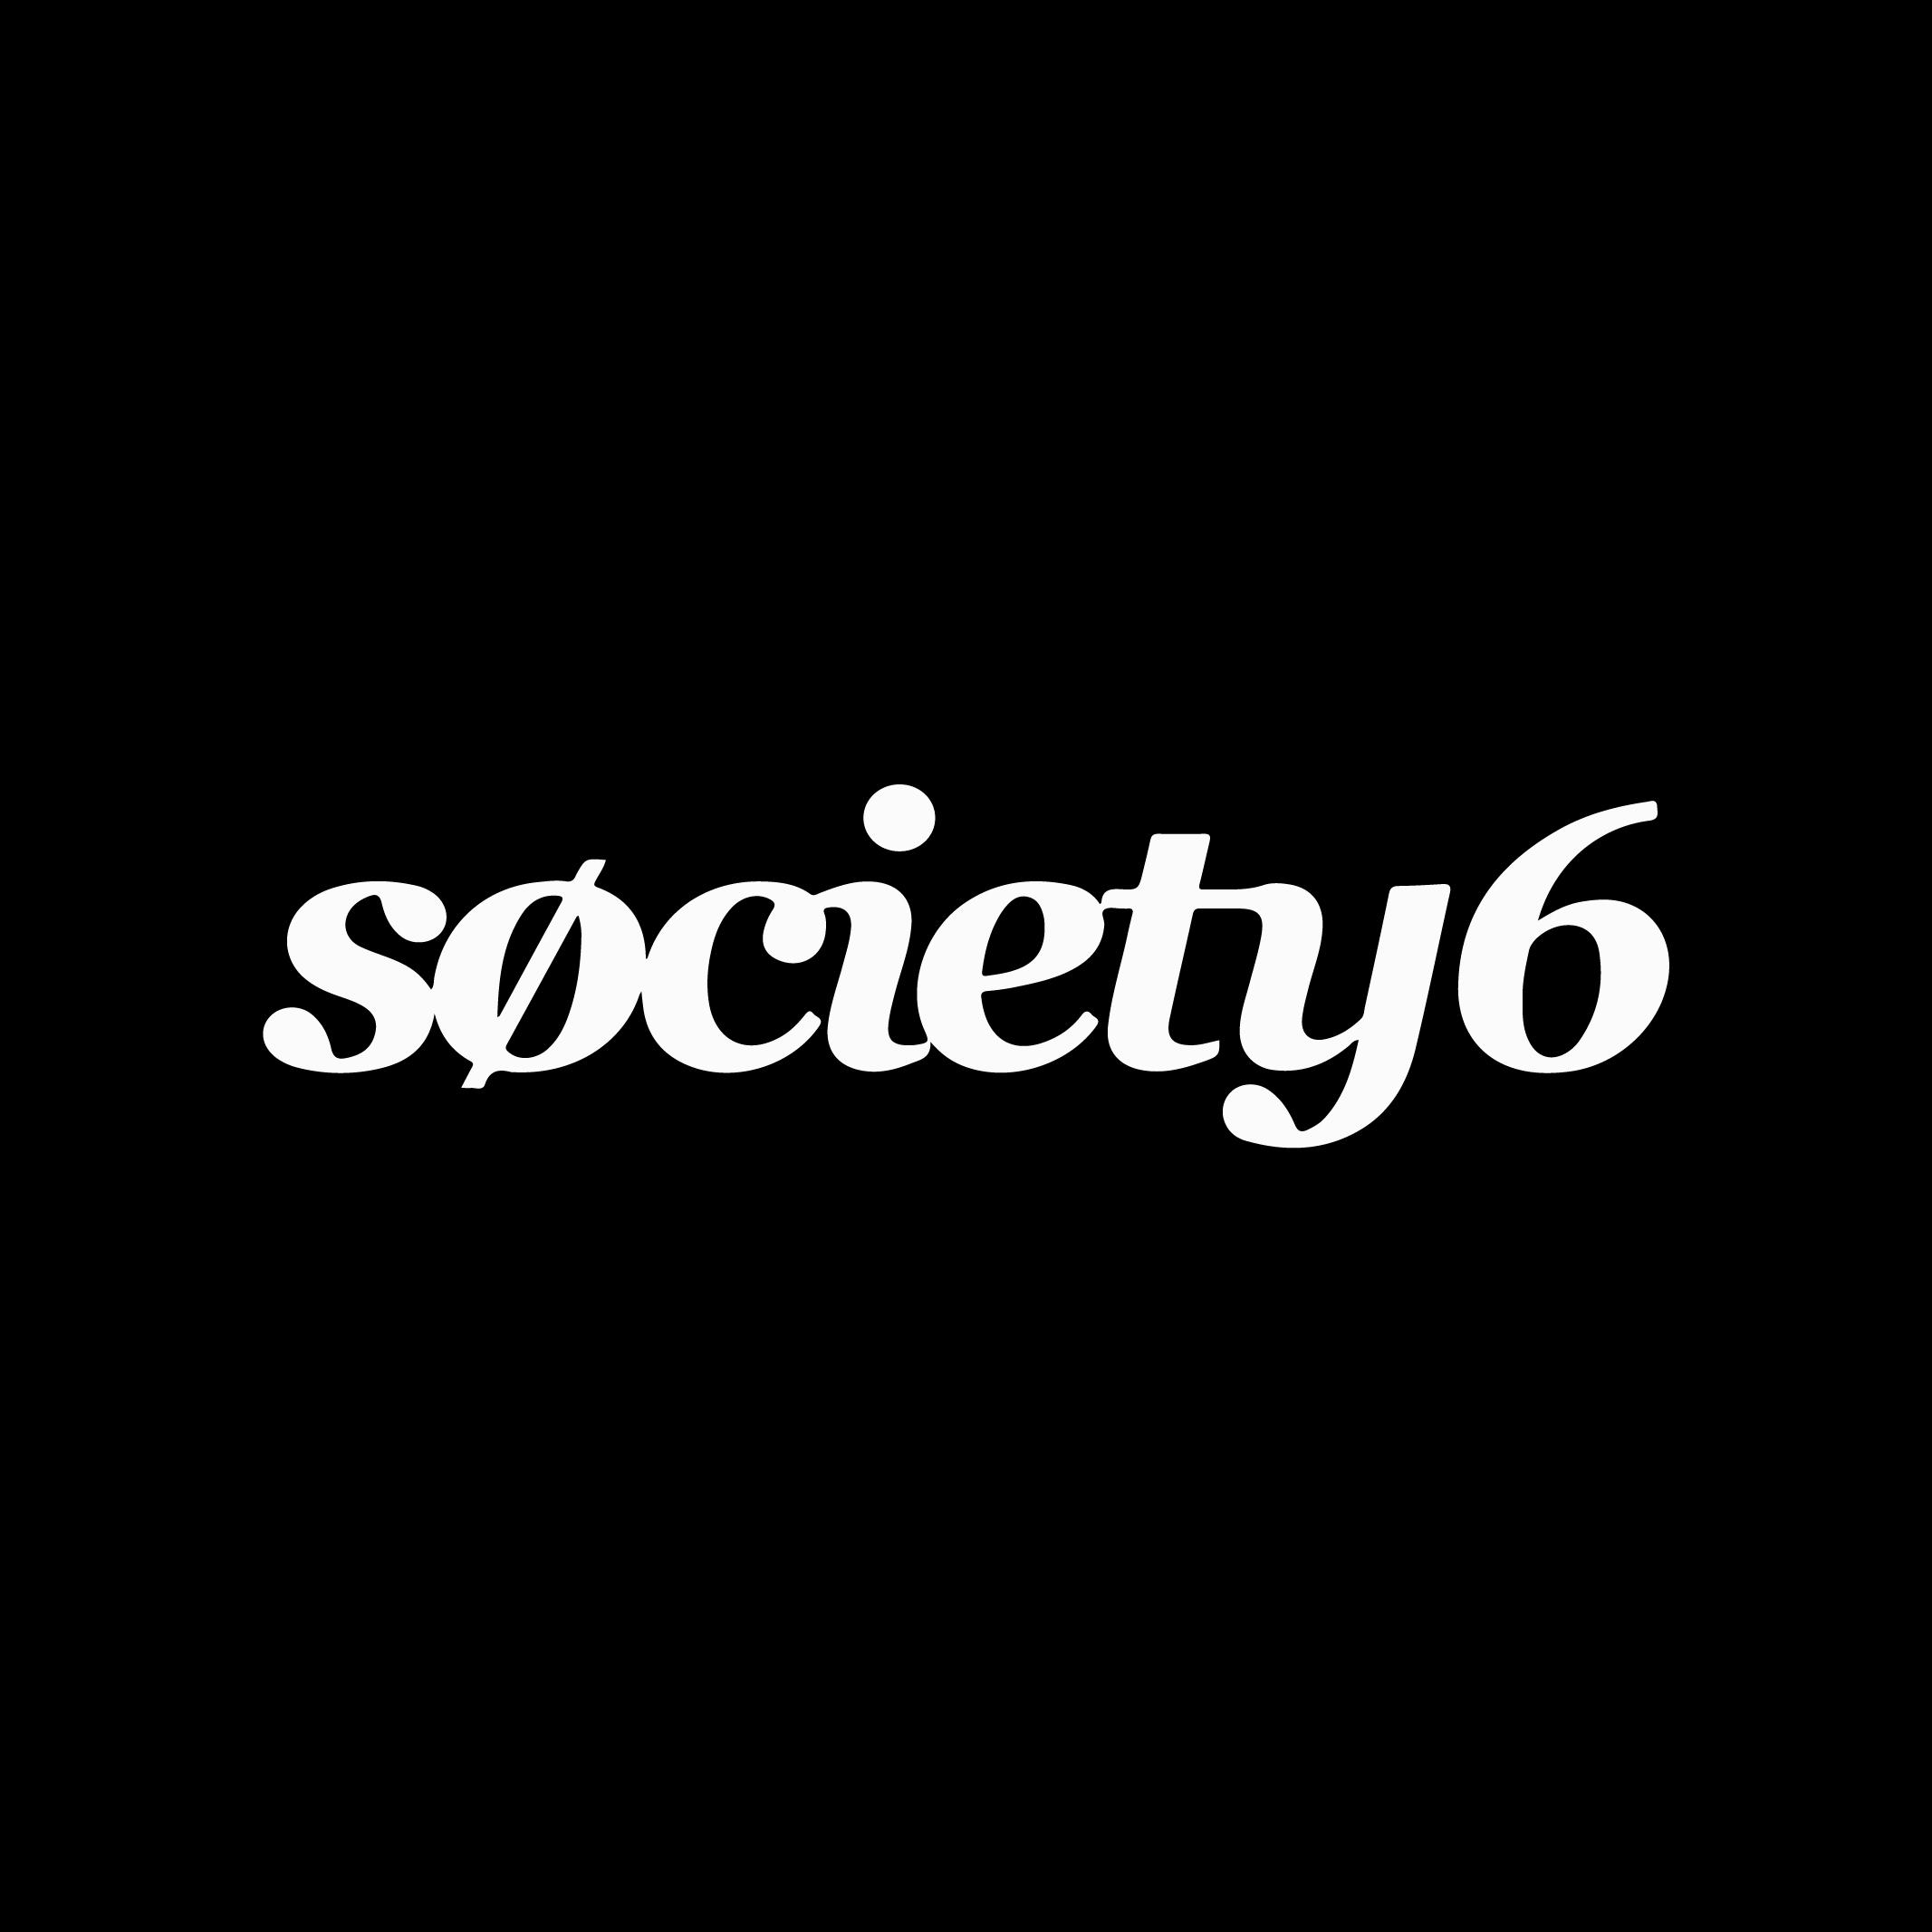 society6-01.jpg